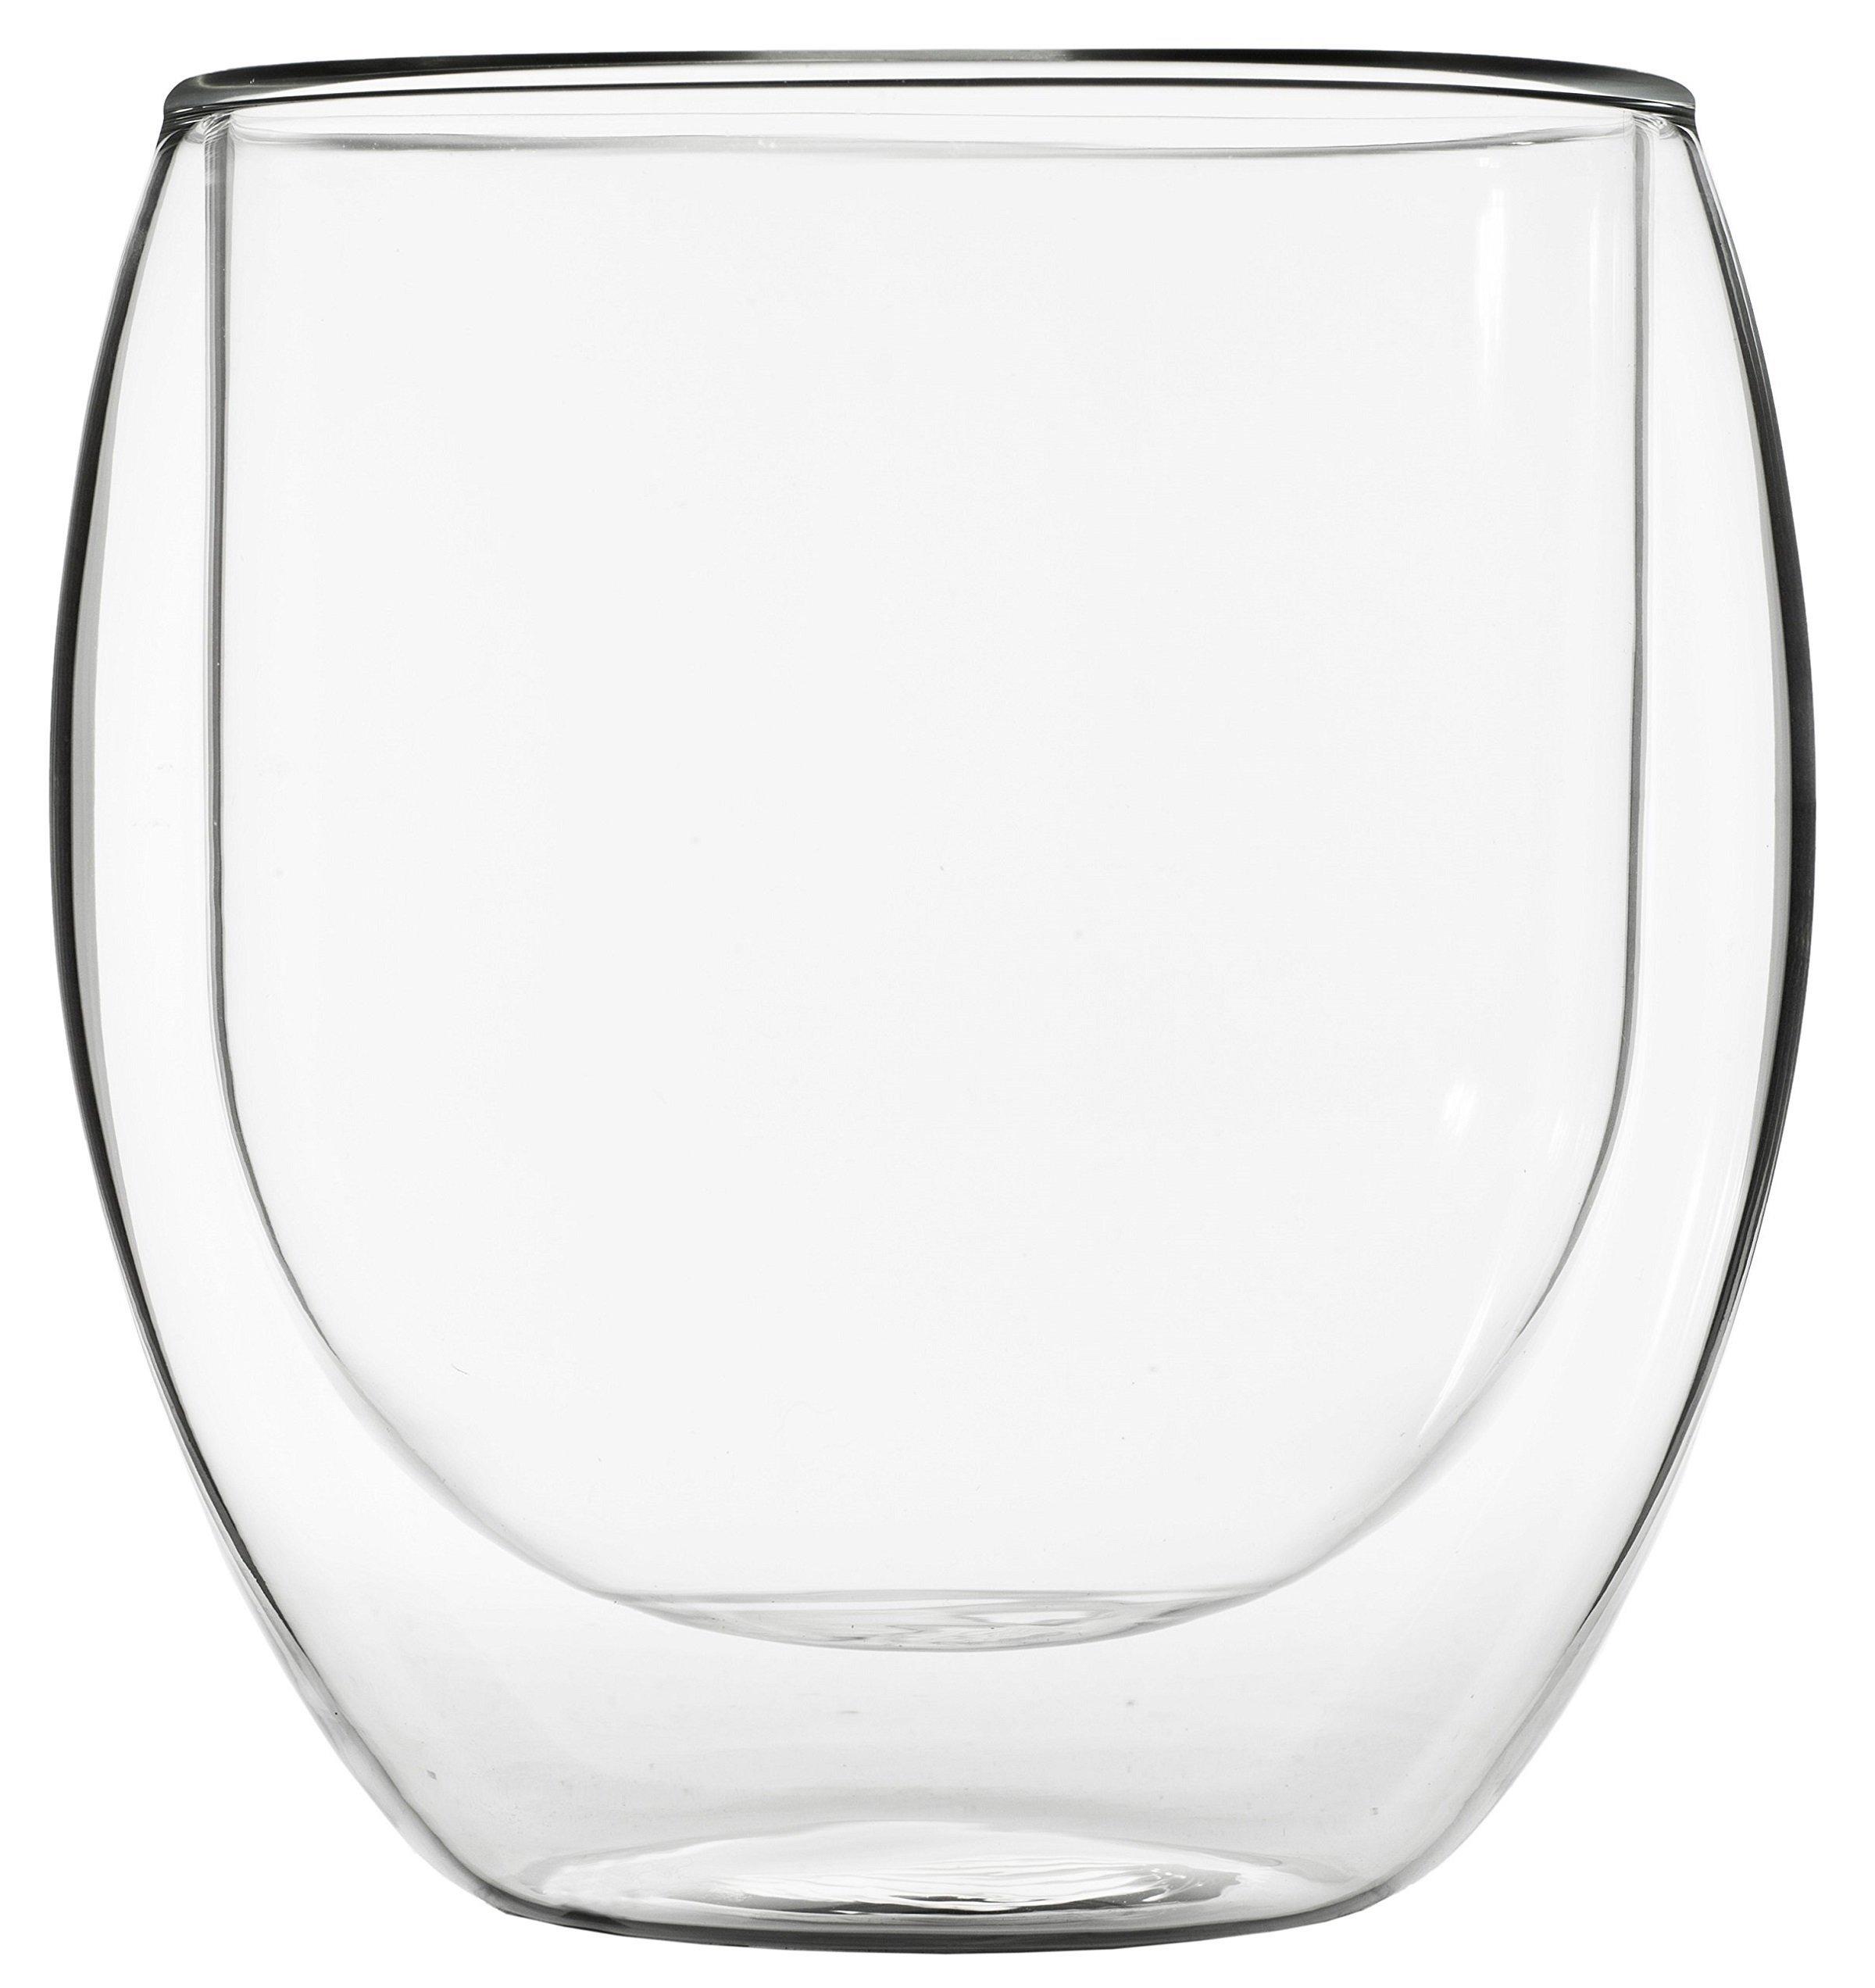 Feelino-410ml-Jumbo-Duos-Teeglas-1x-Zubehr